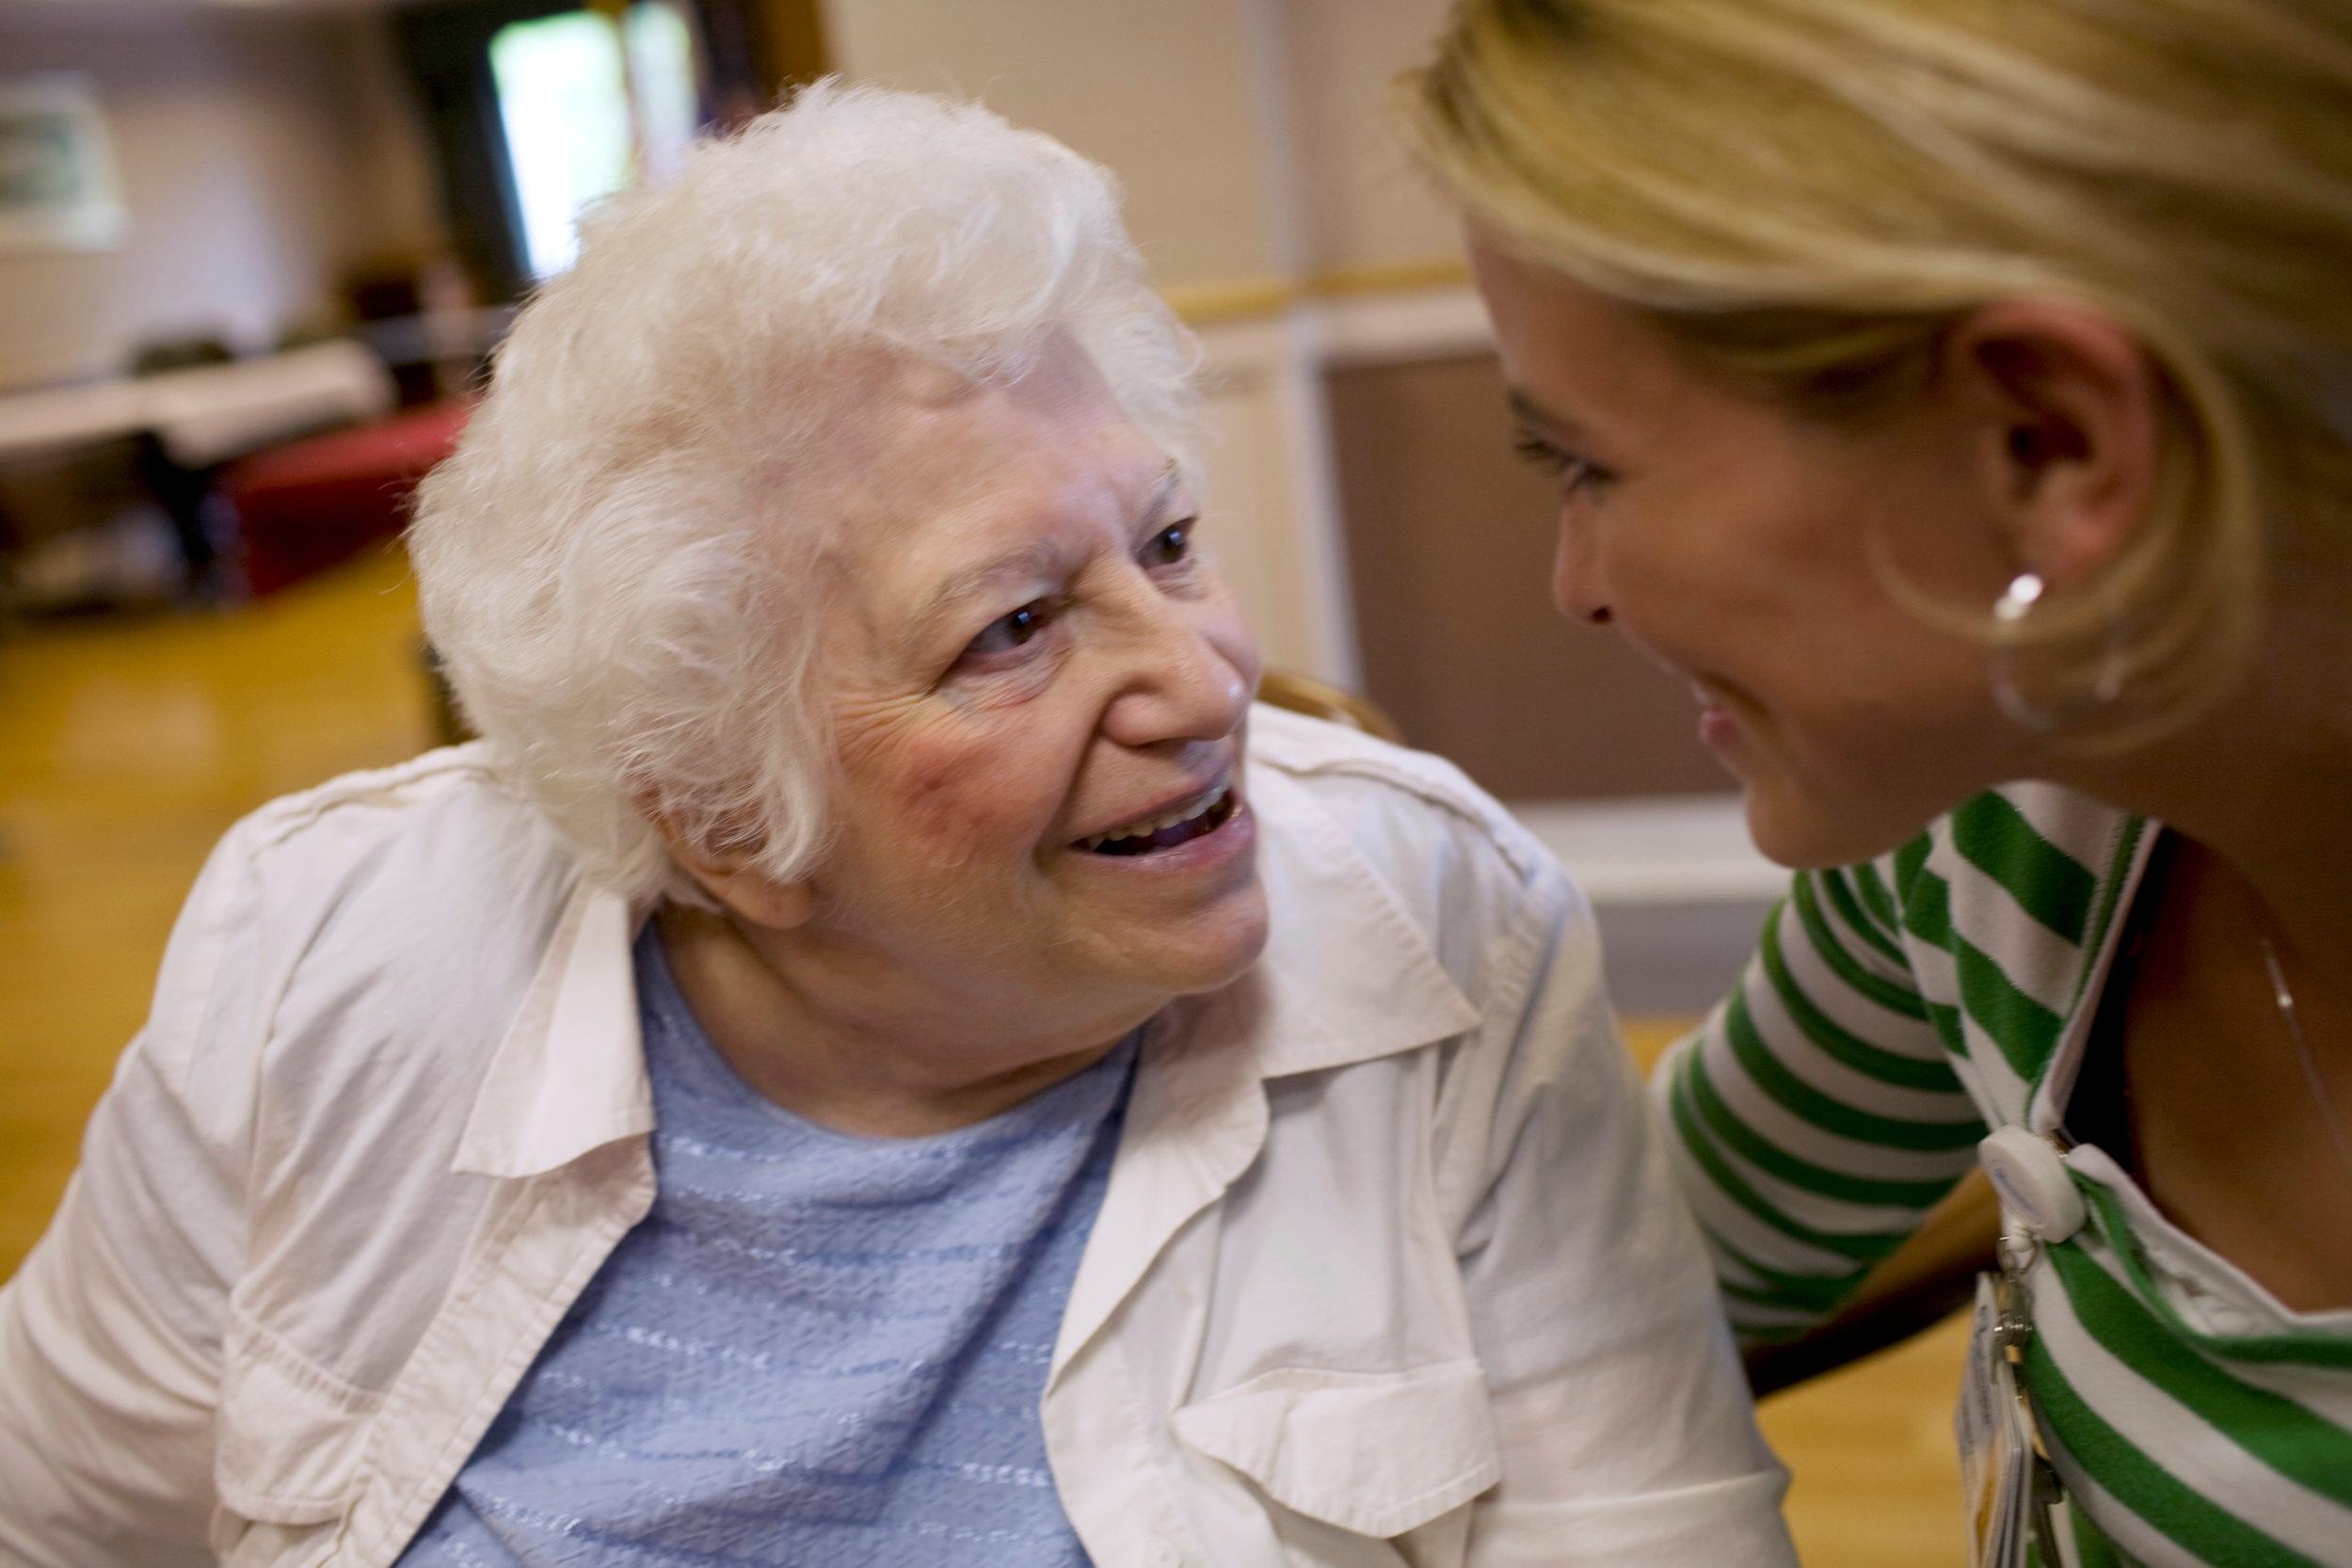 Volunteer+Talks+to+Senior+Woman.jpg